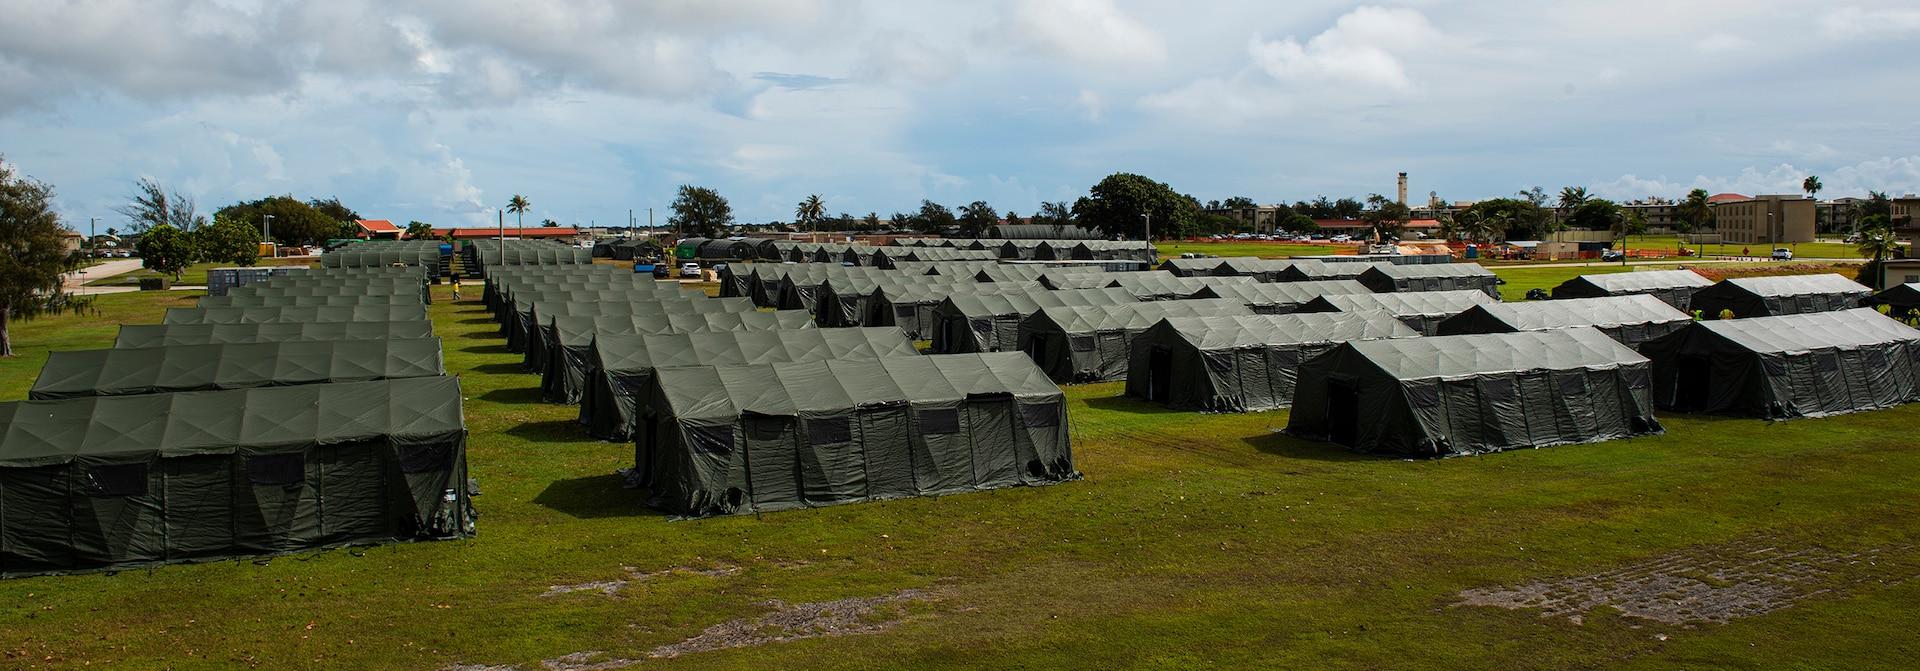 Logistics Readiness Squadron puts up thousands